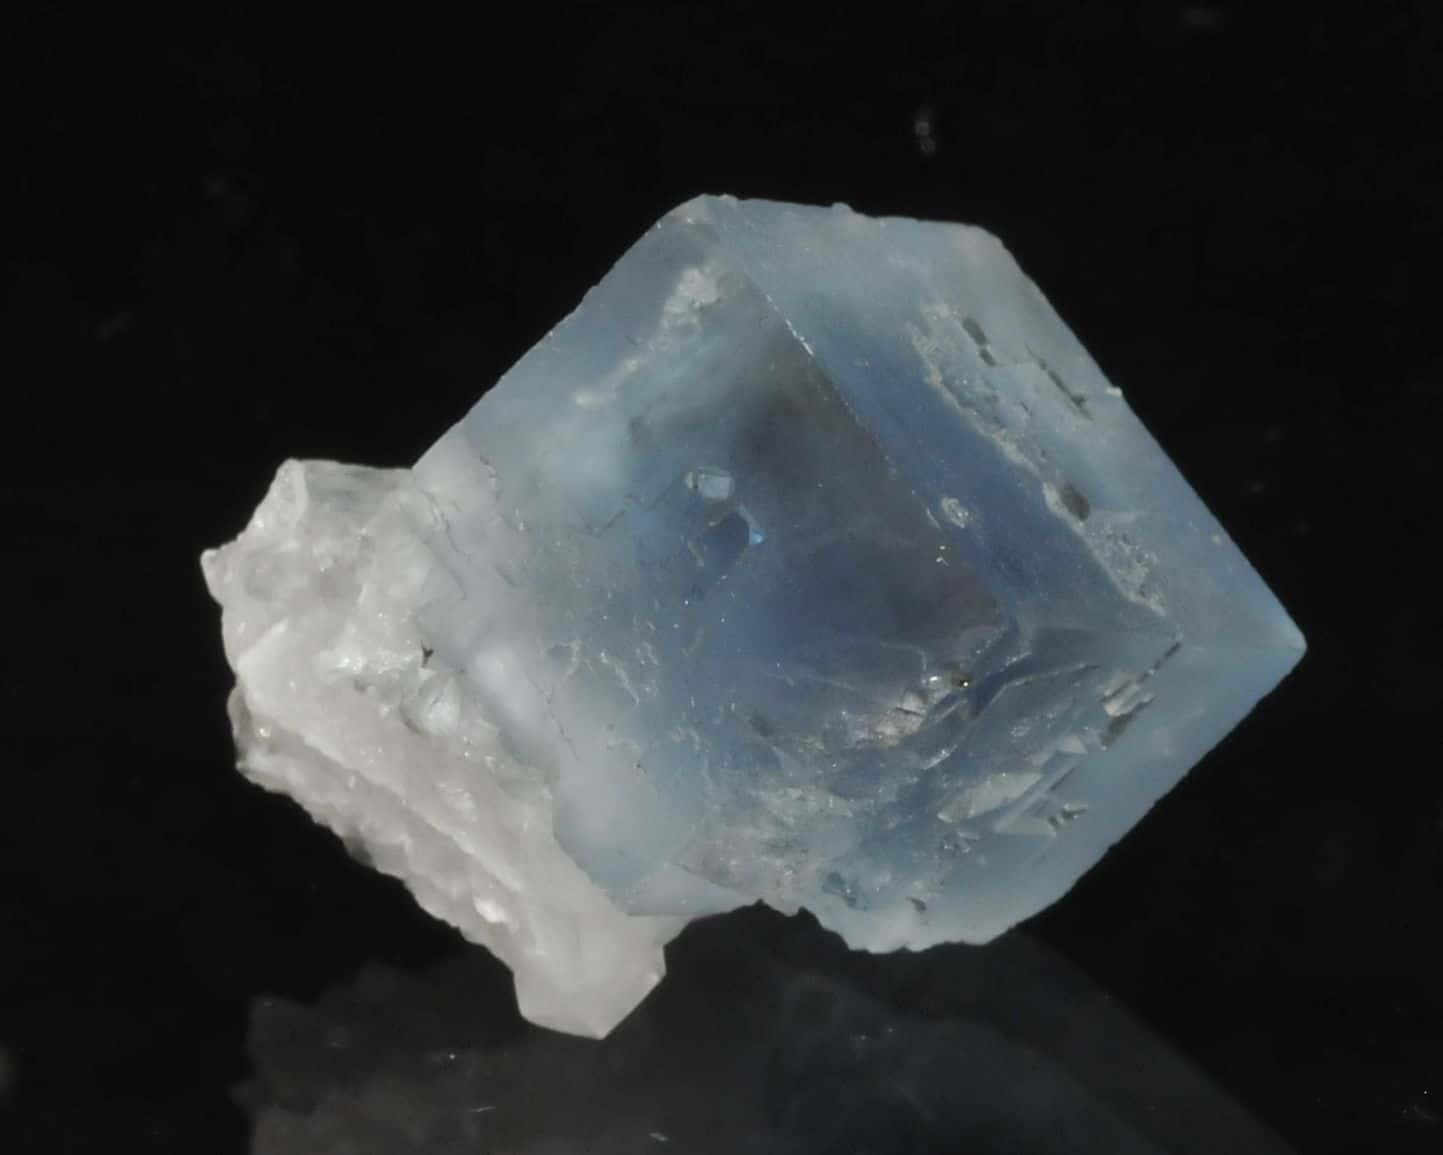 Blue fluorite from the Burc mine in Tarn, France